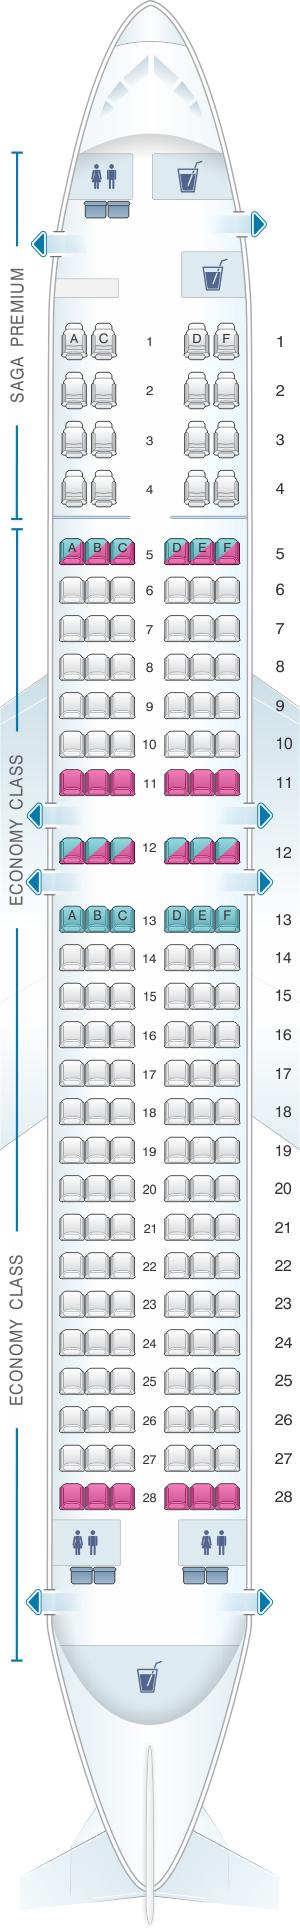 Seat map for Icelandair Boeing B737 MAX 8